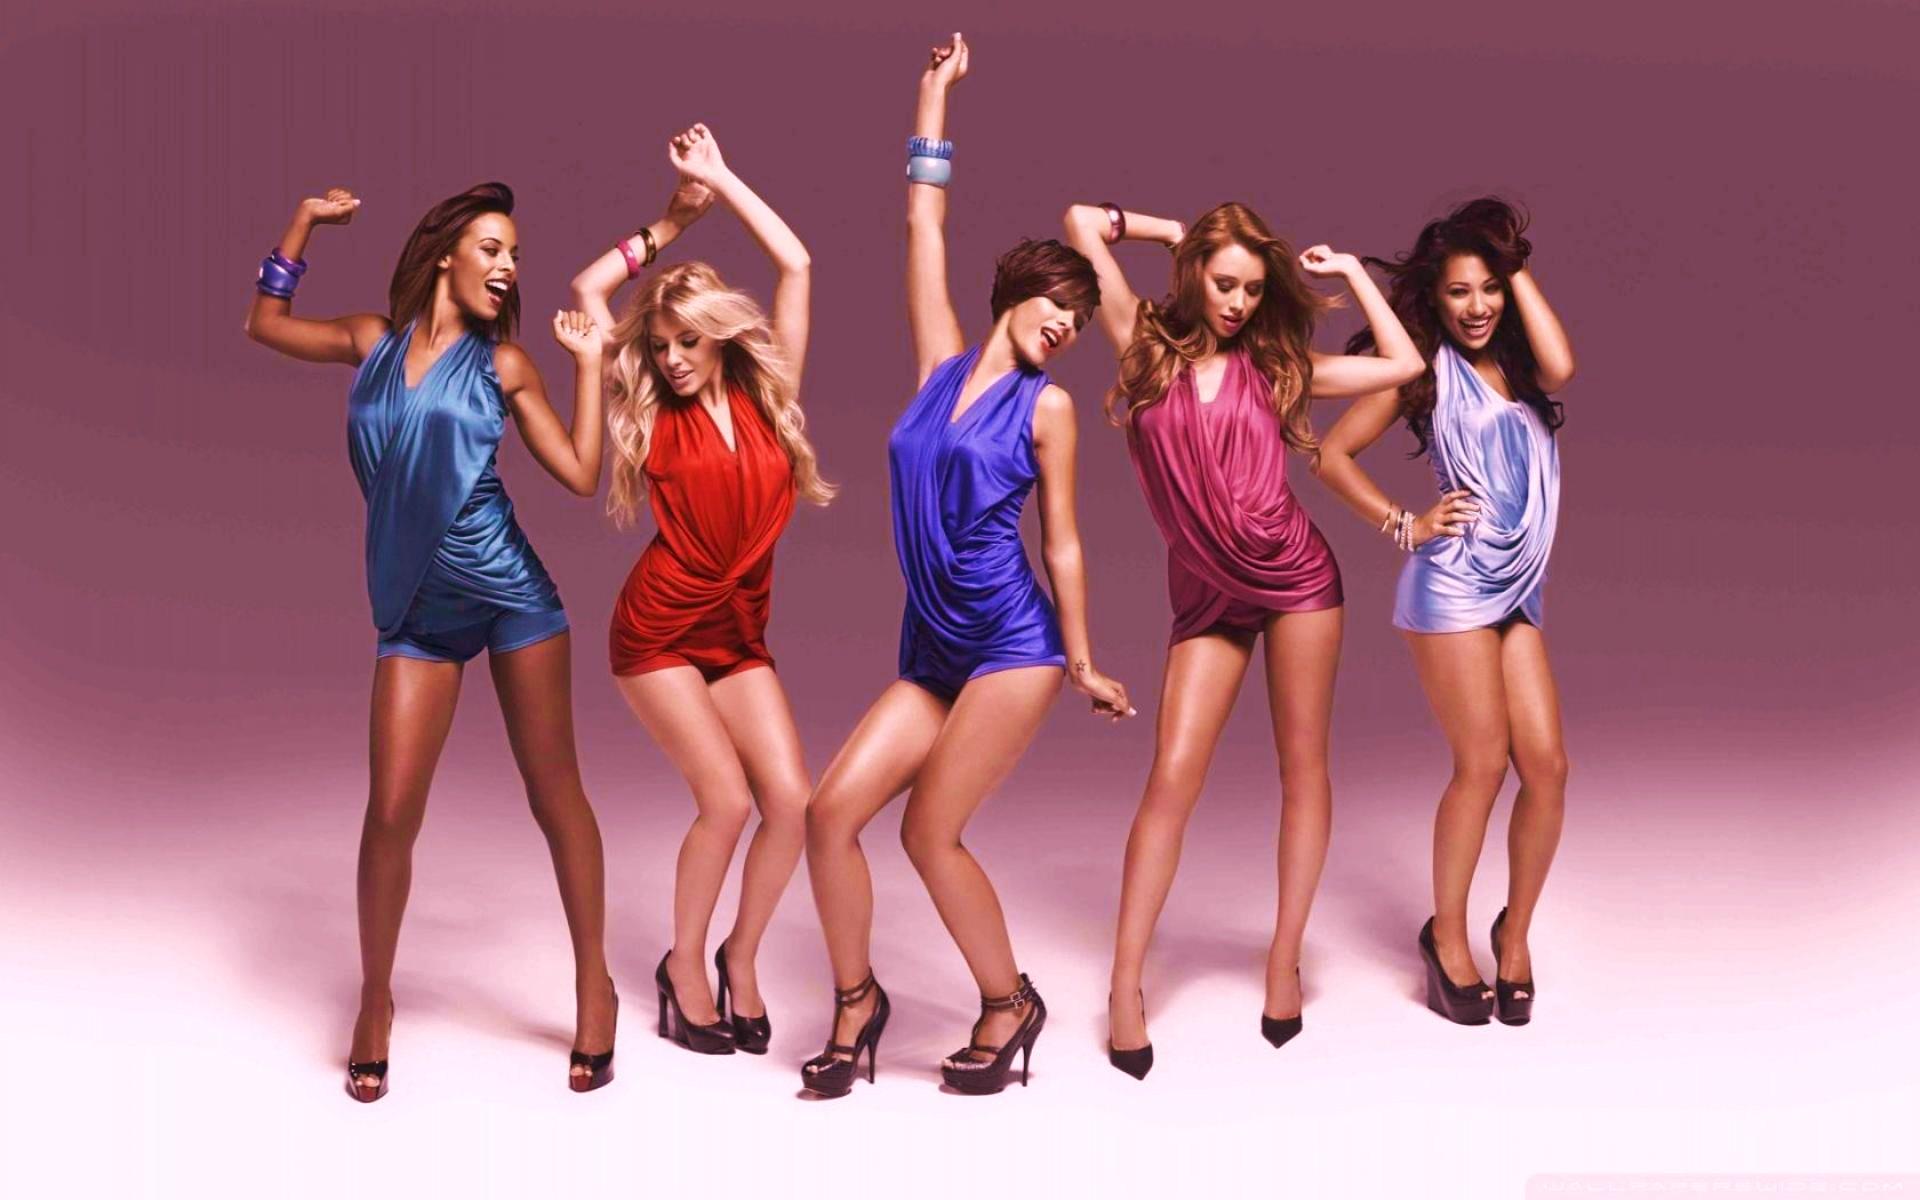 фото танцы девушек